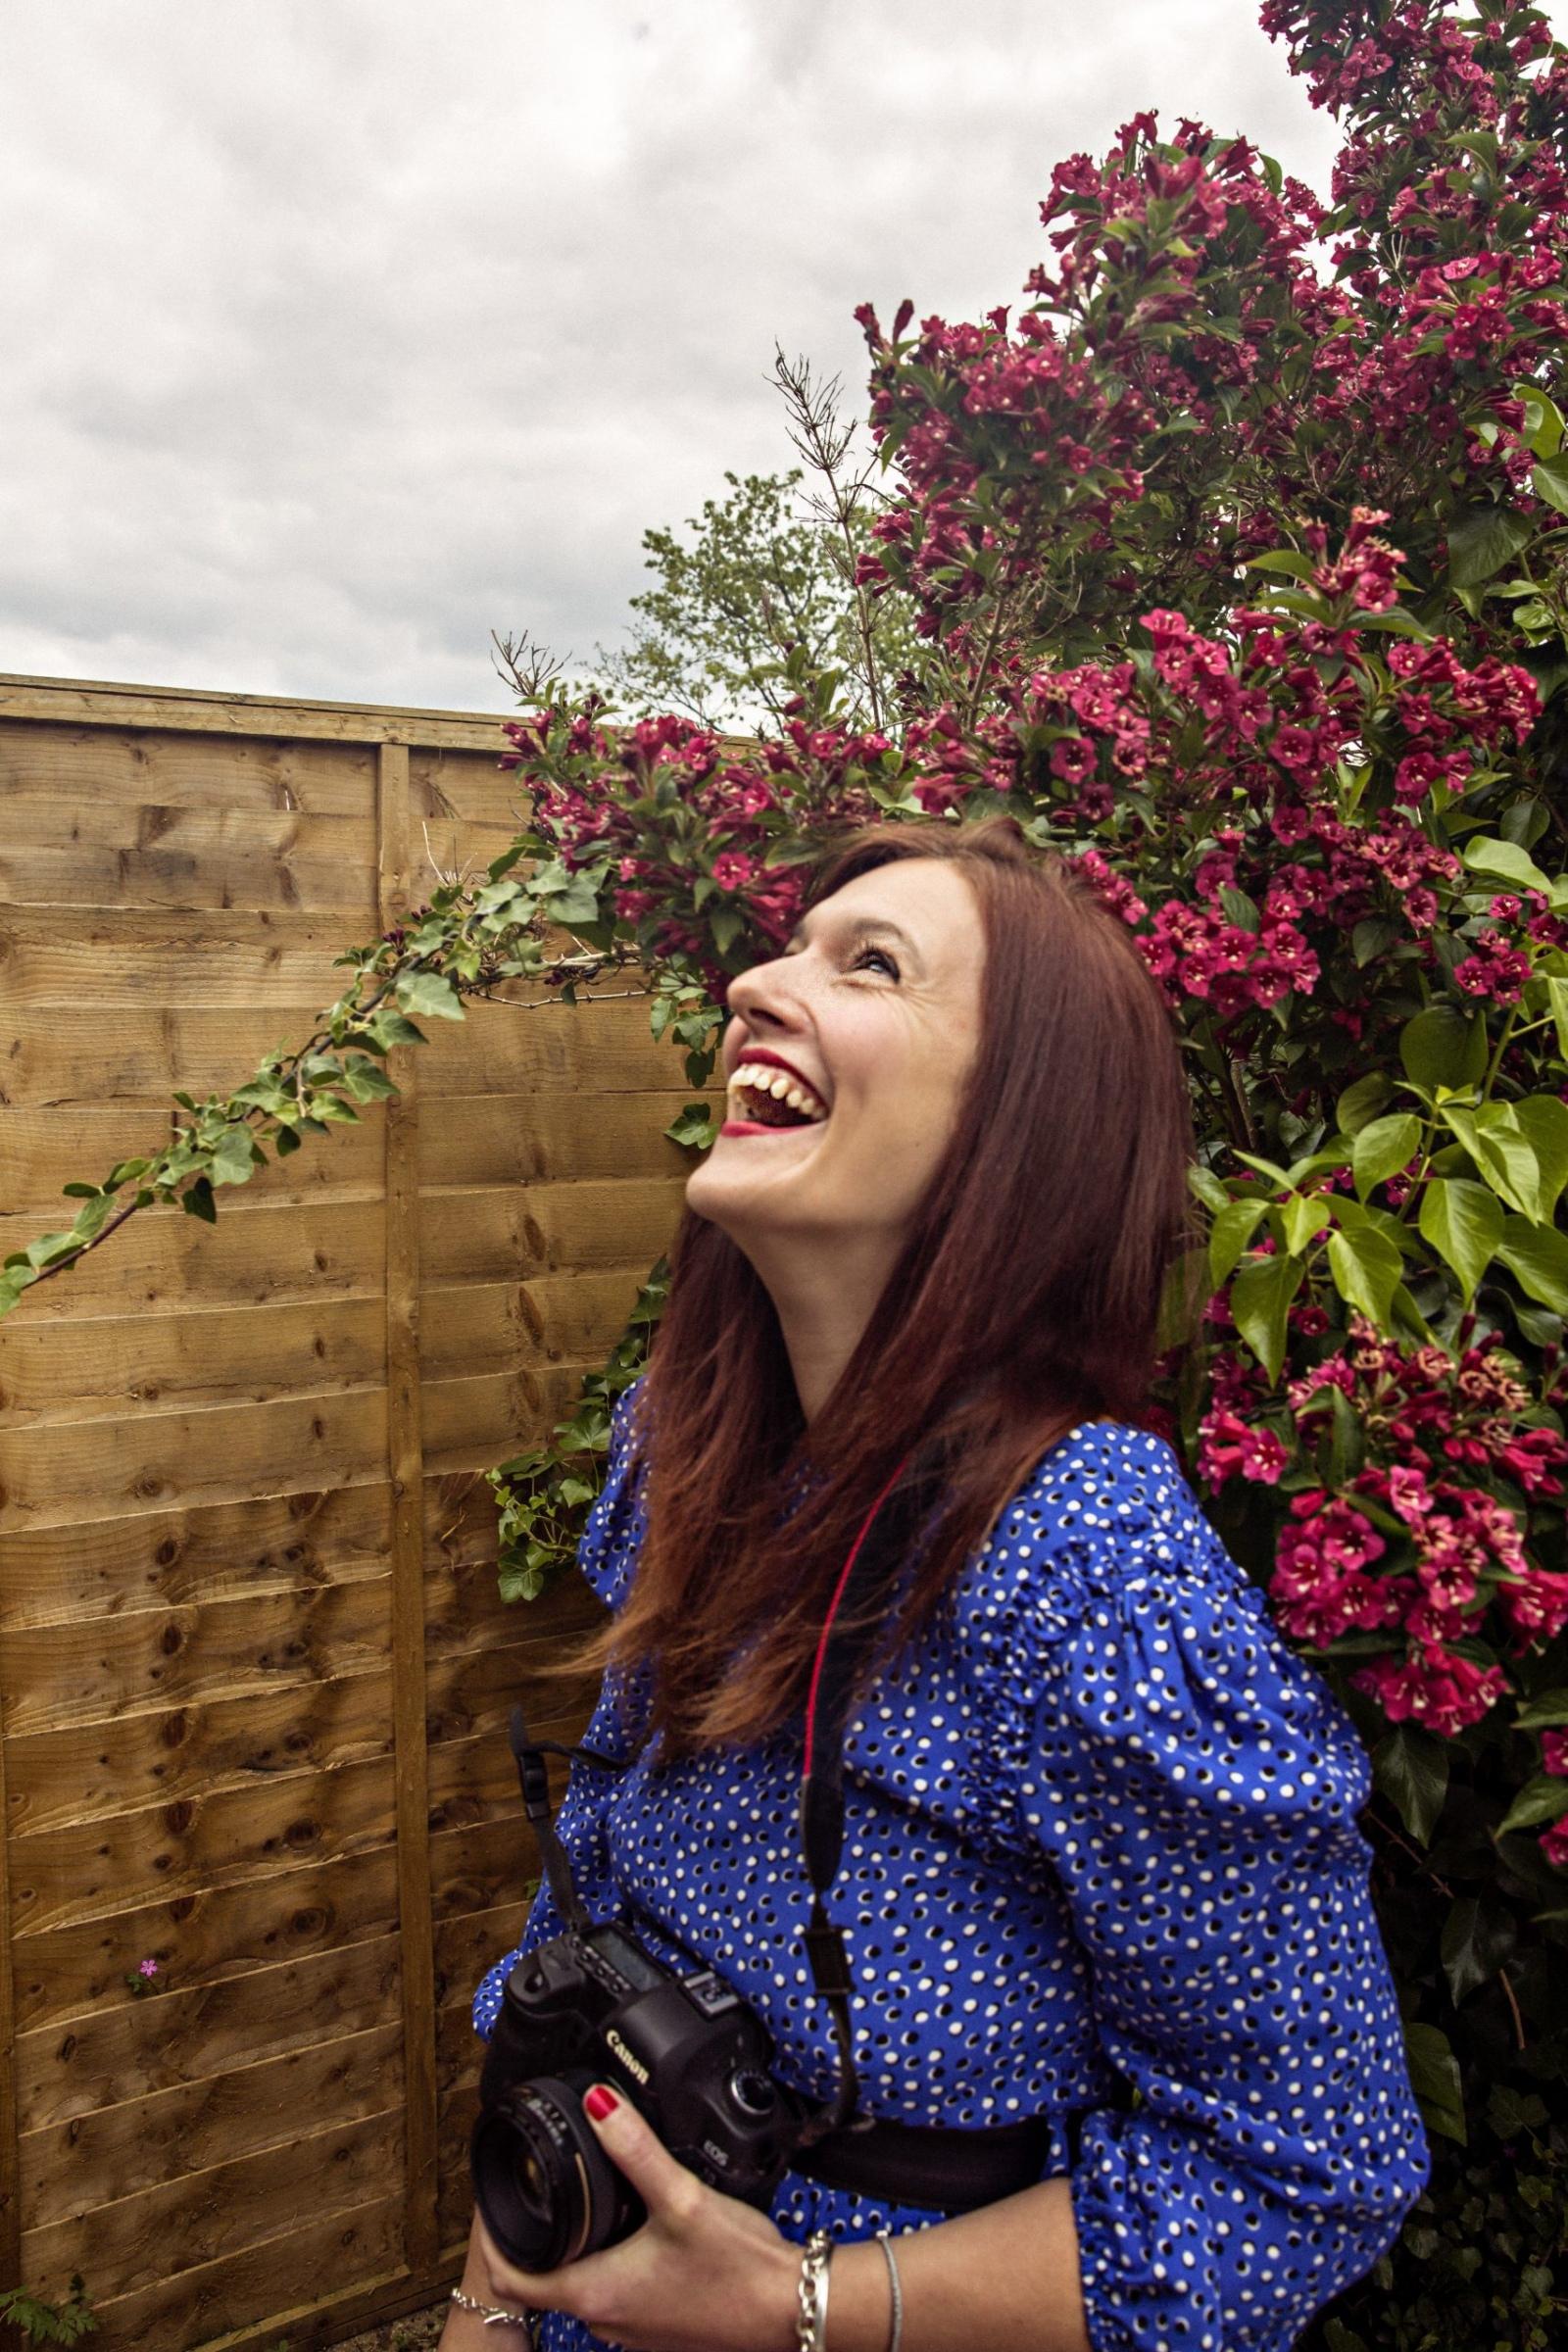 Natalie Martinez wedding and events photographer hertfordshire and London